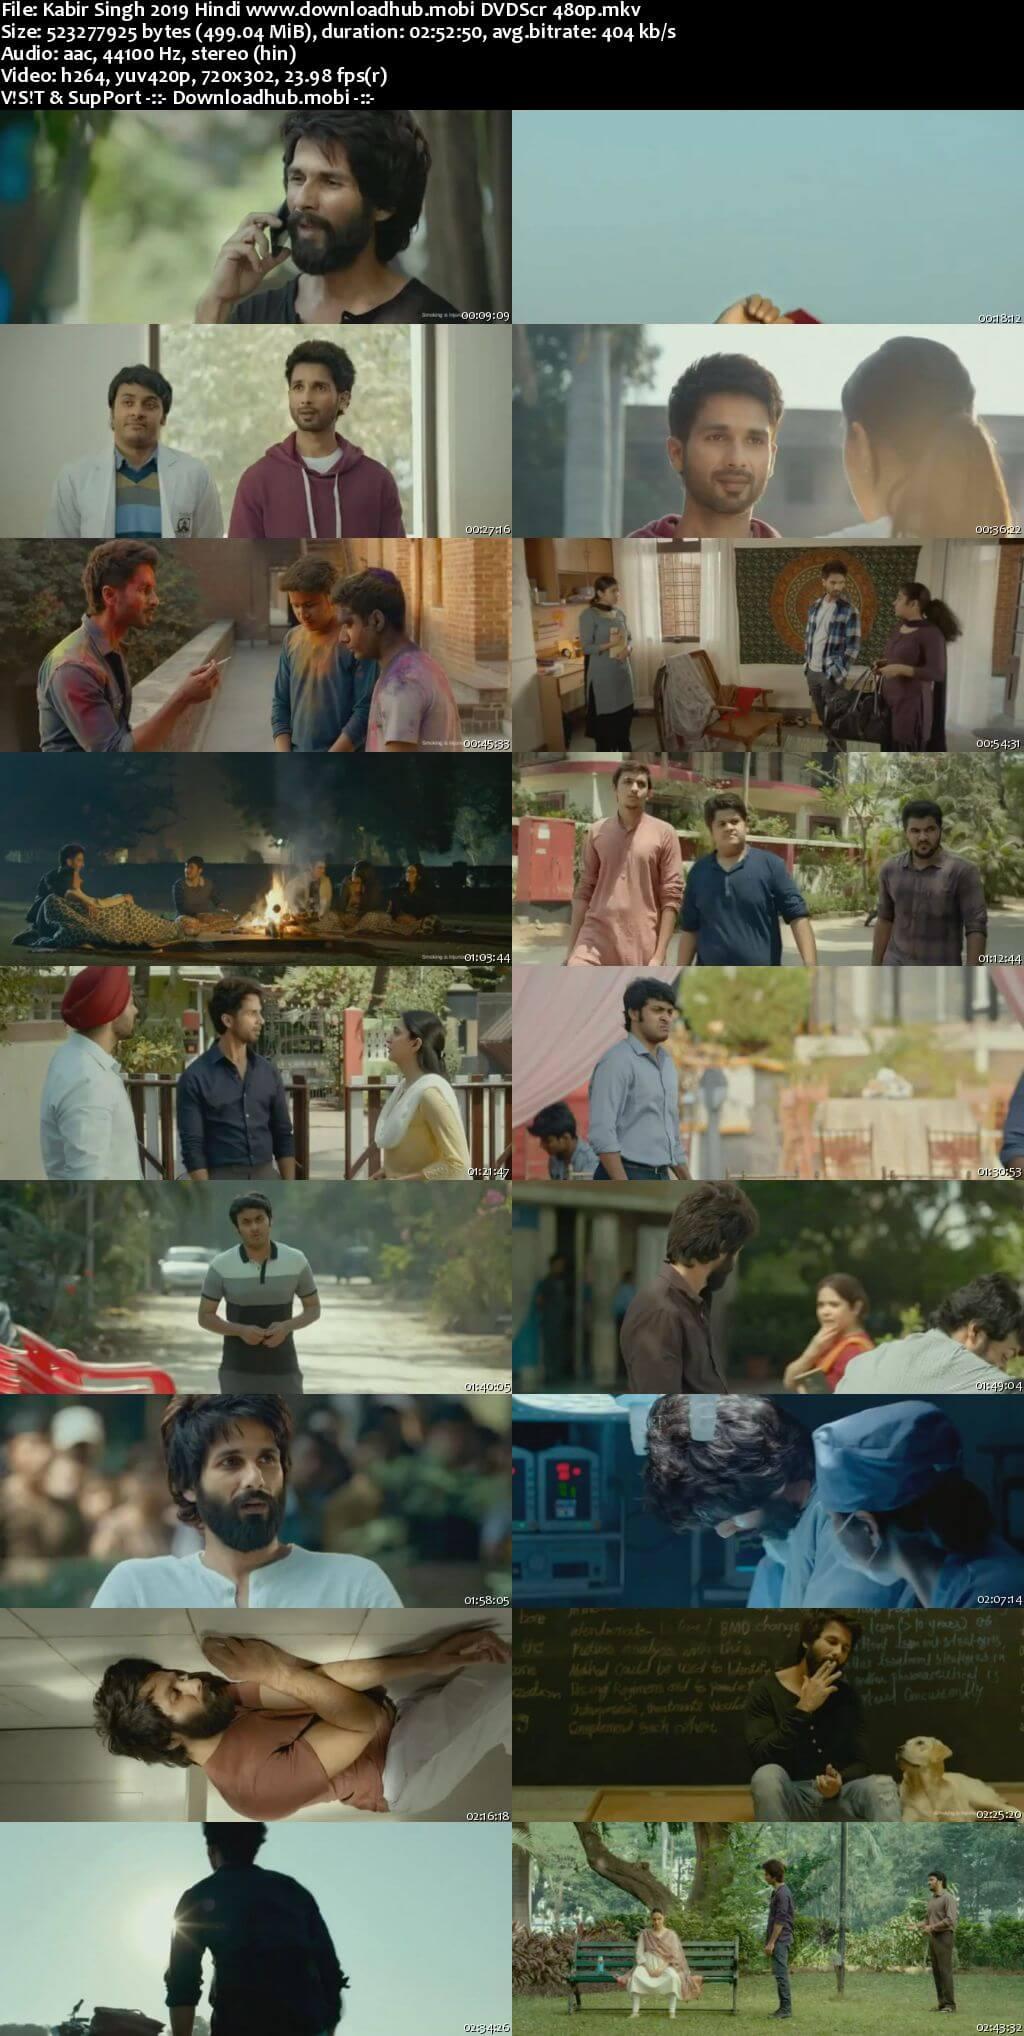 Kabir Singh 2019 Hindi 500MB DVDScr 480p